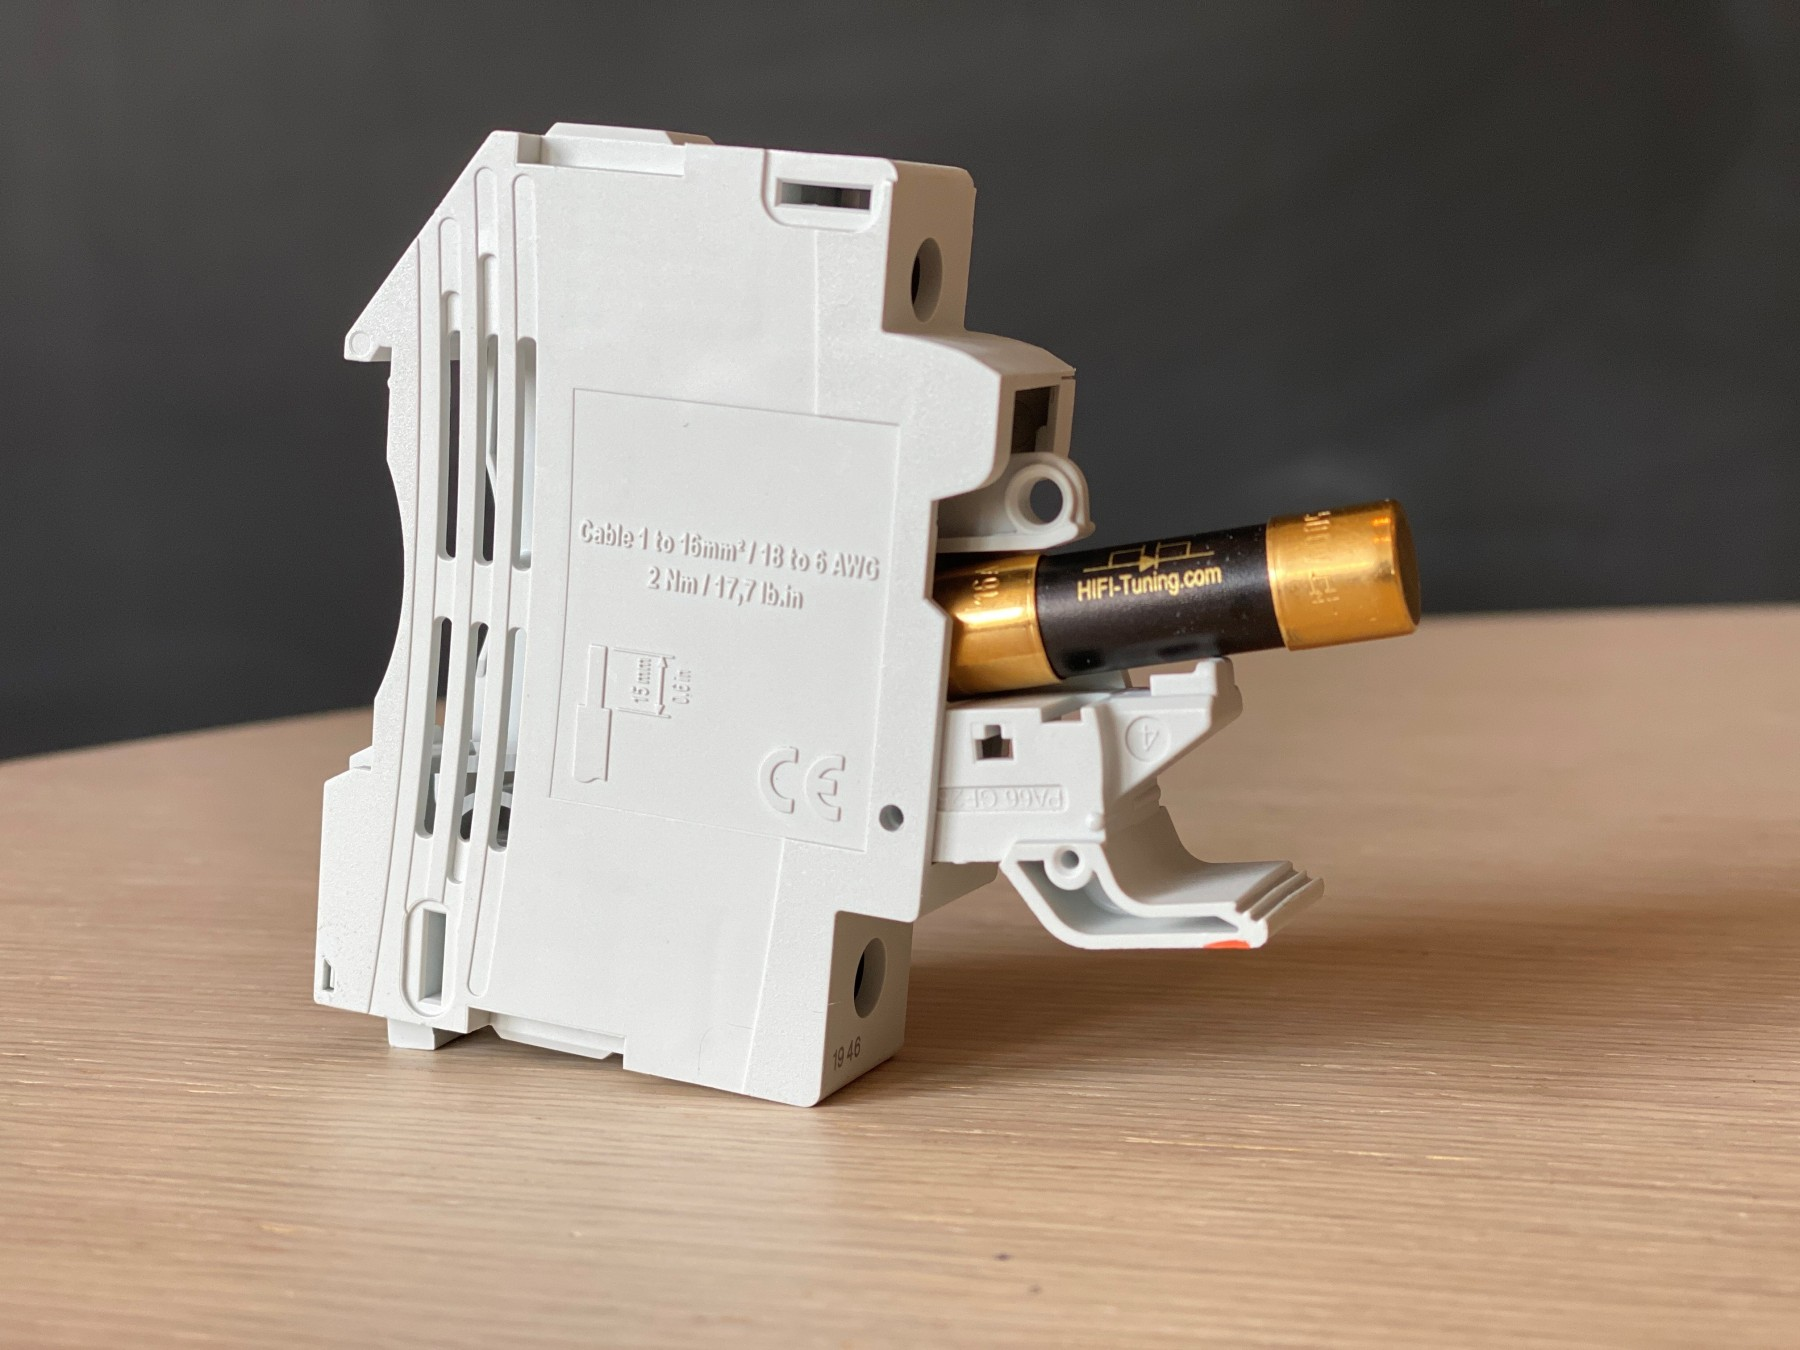 Silber-Gold F T + träge HiFi-Tuning Feinsicherung US-Supreme³ 6,3x32mm flink